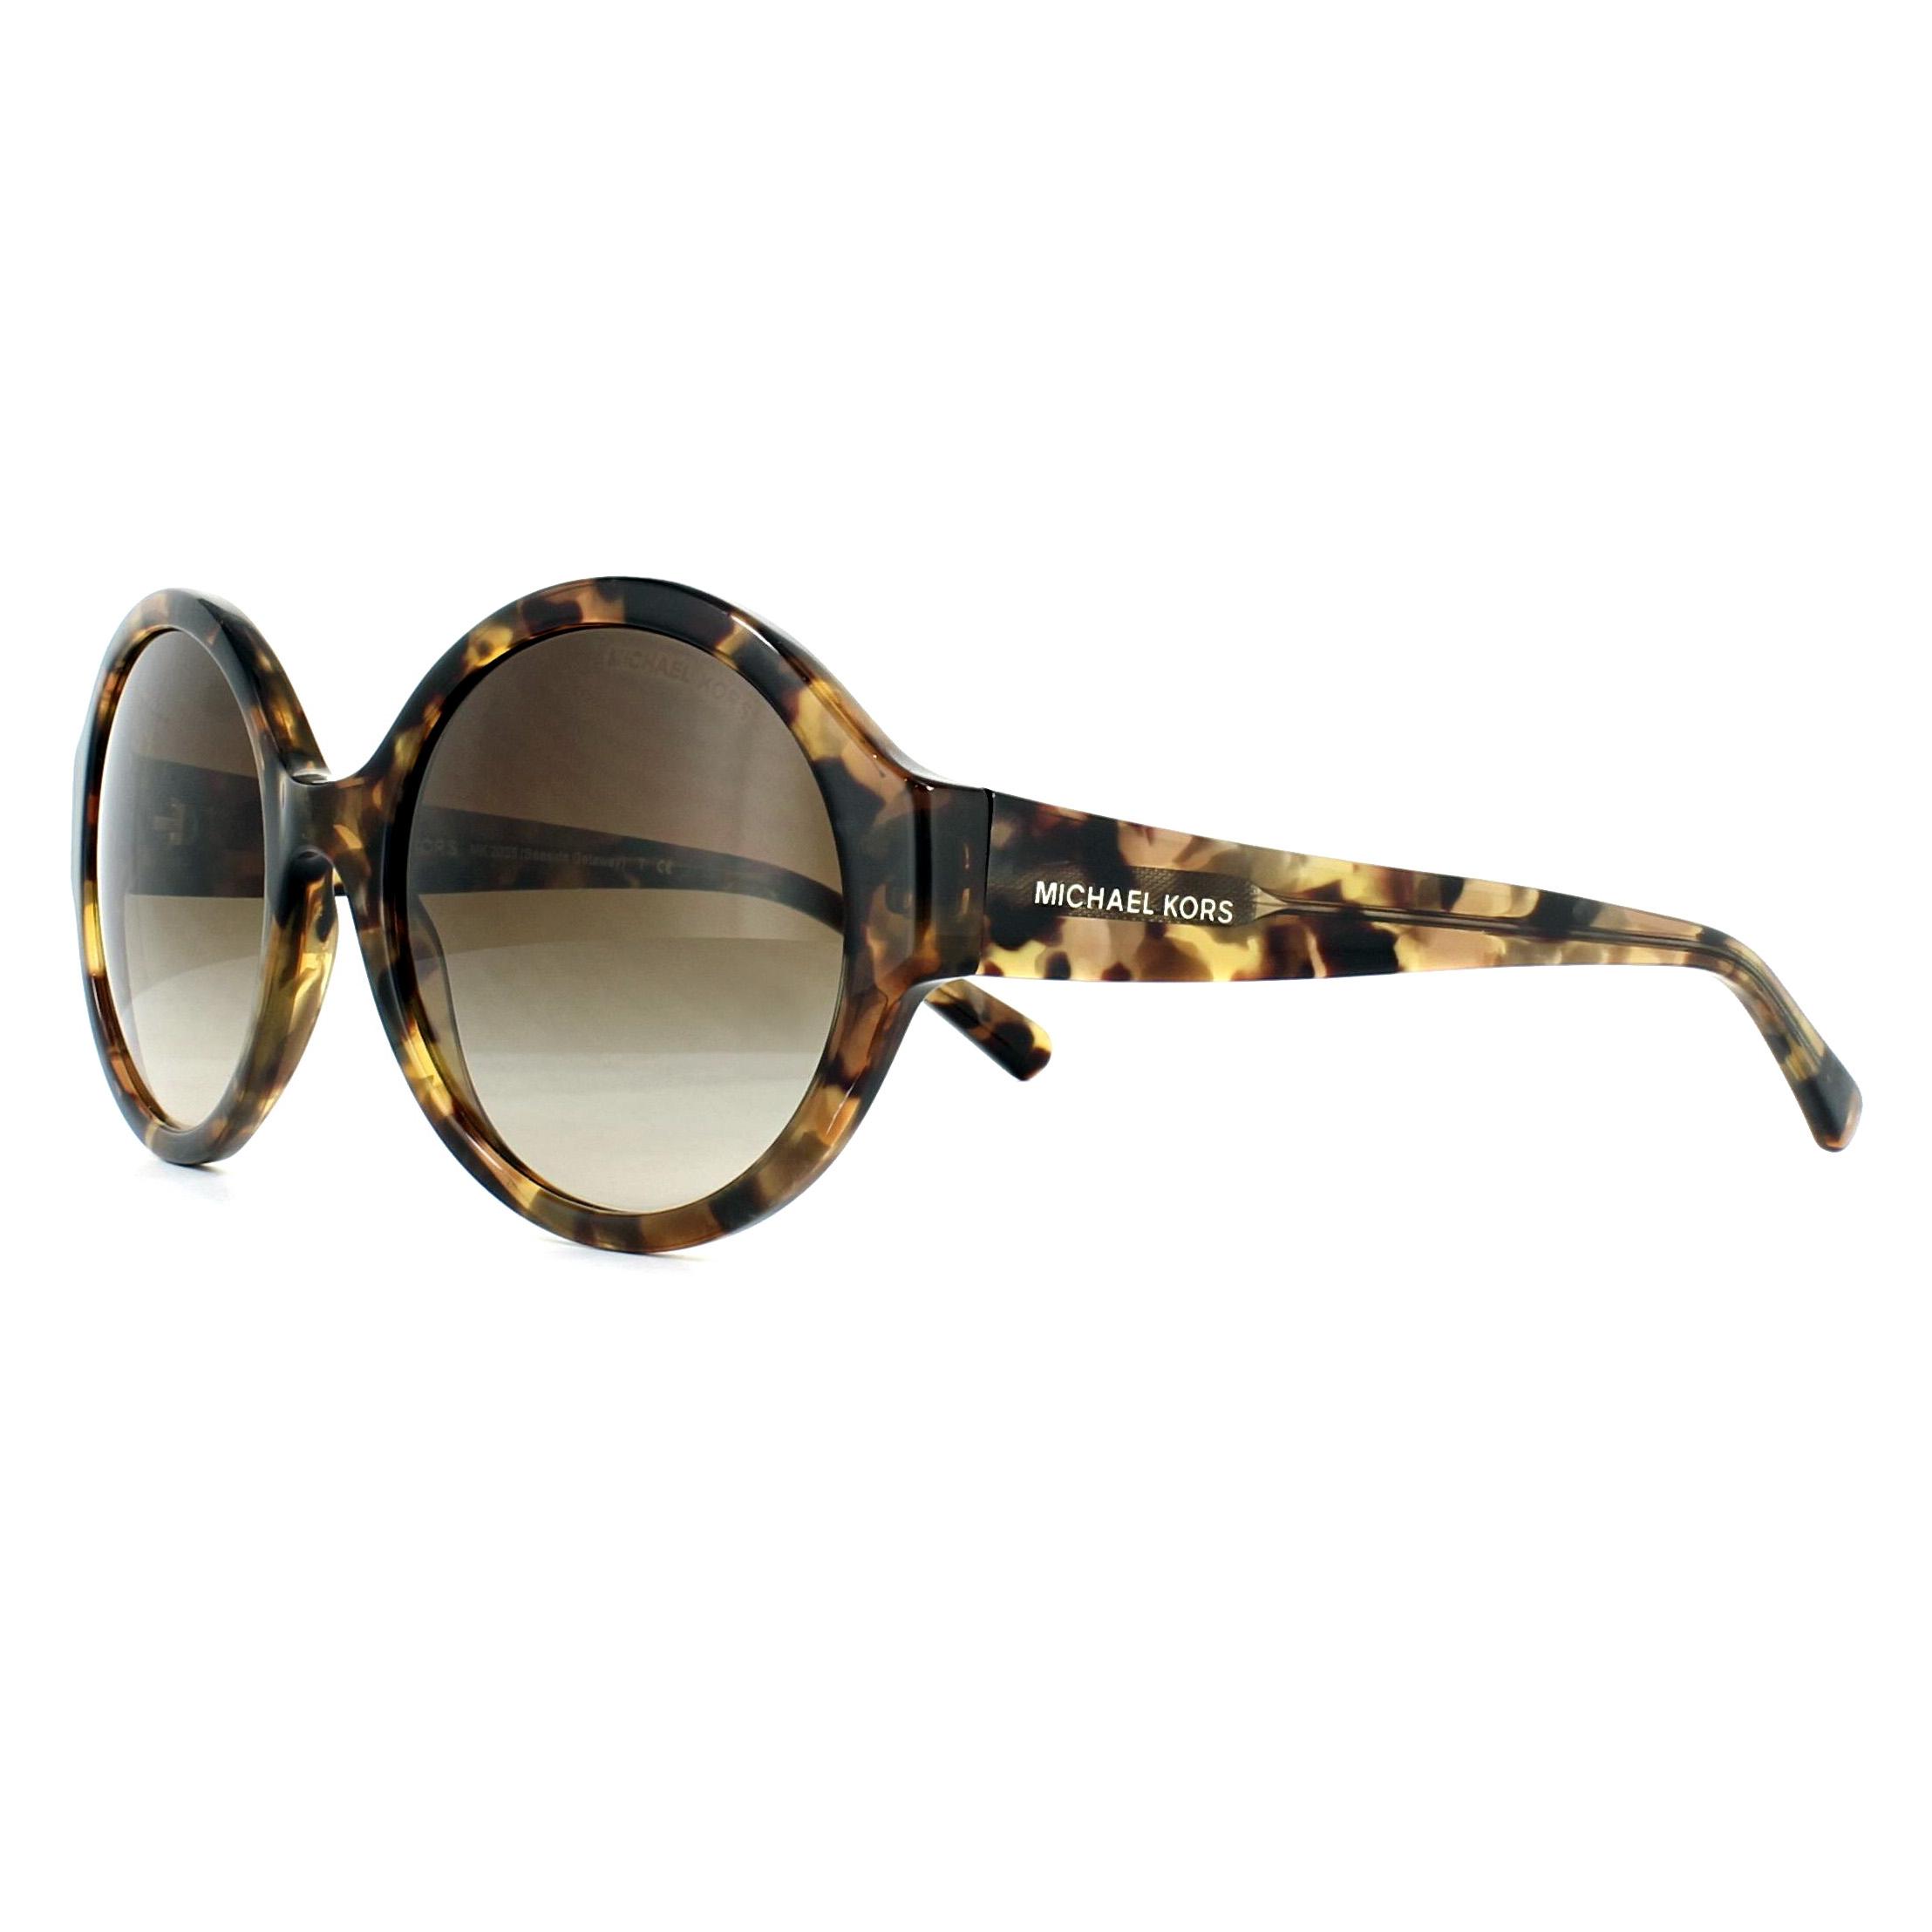 e6af0d8bc3 Sentinel Michael Kors Sunglasses Seaside Getaway 2035 321013 Brown Medley  Brown Gradient